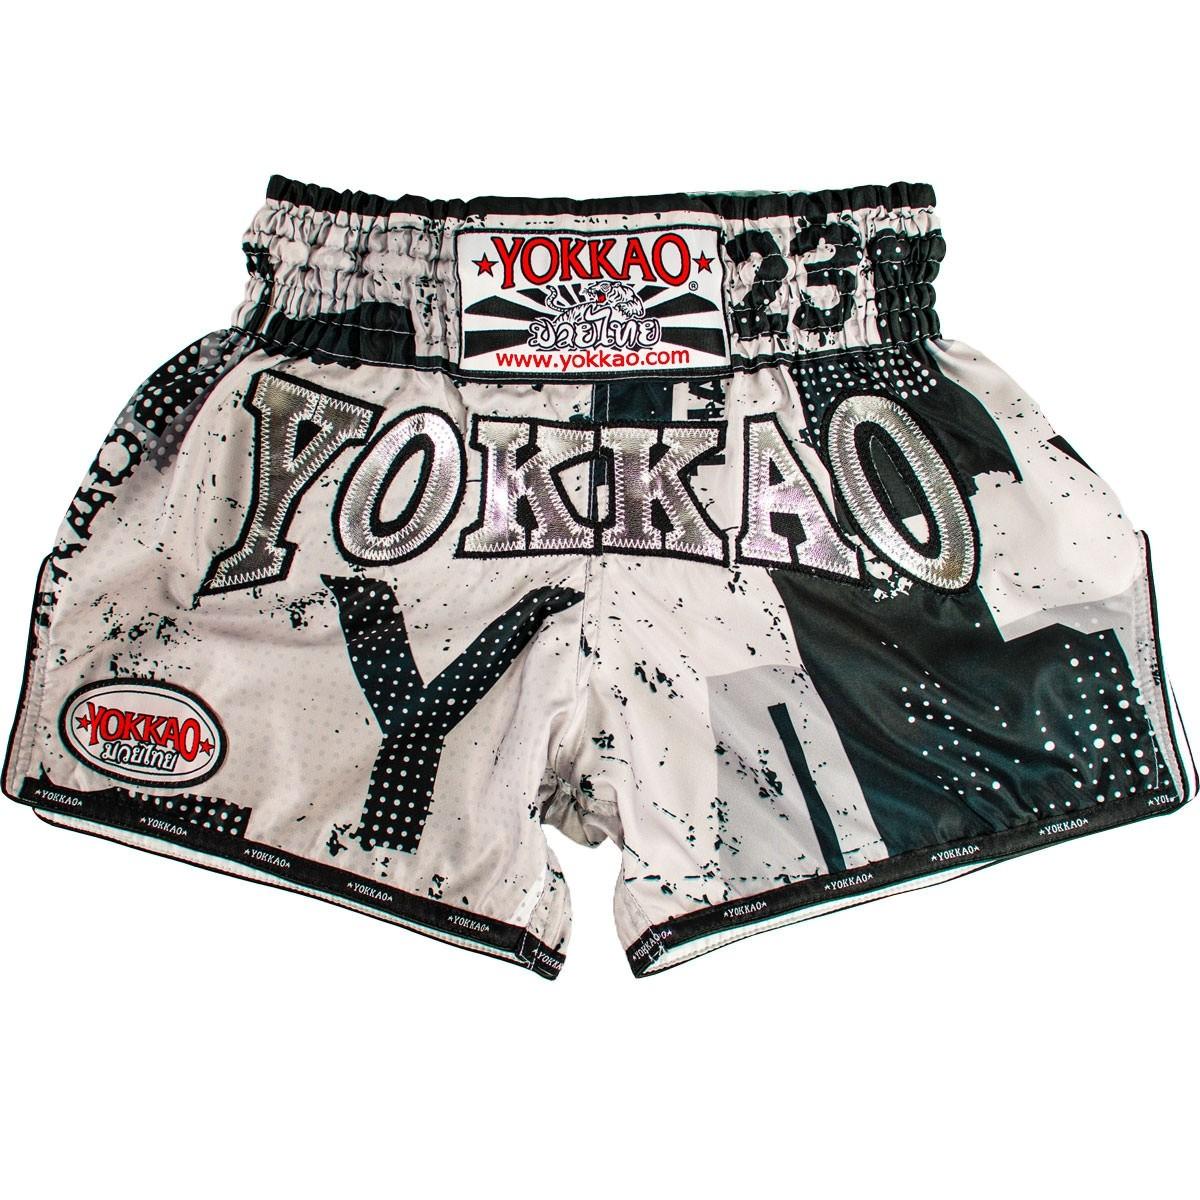 Yokkao Shorts Carbonfit Urban Grey Muay Thai Store